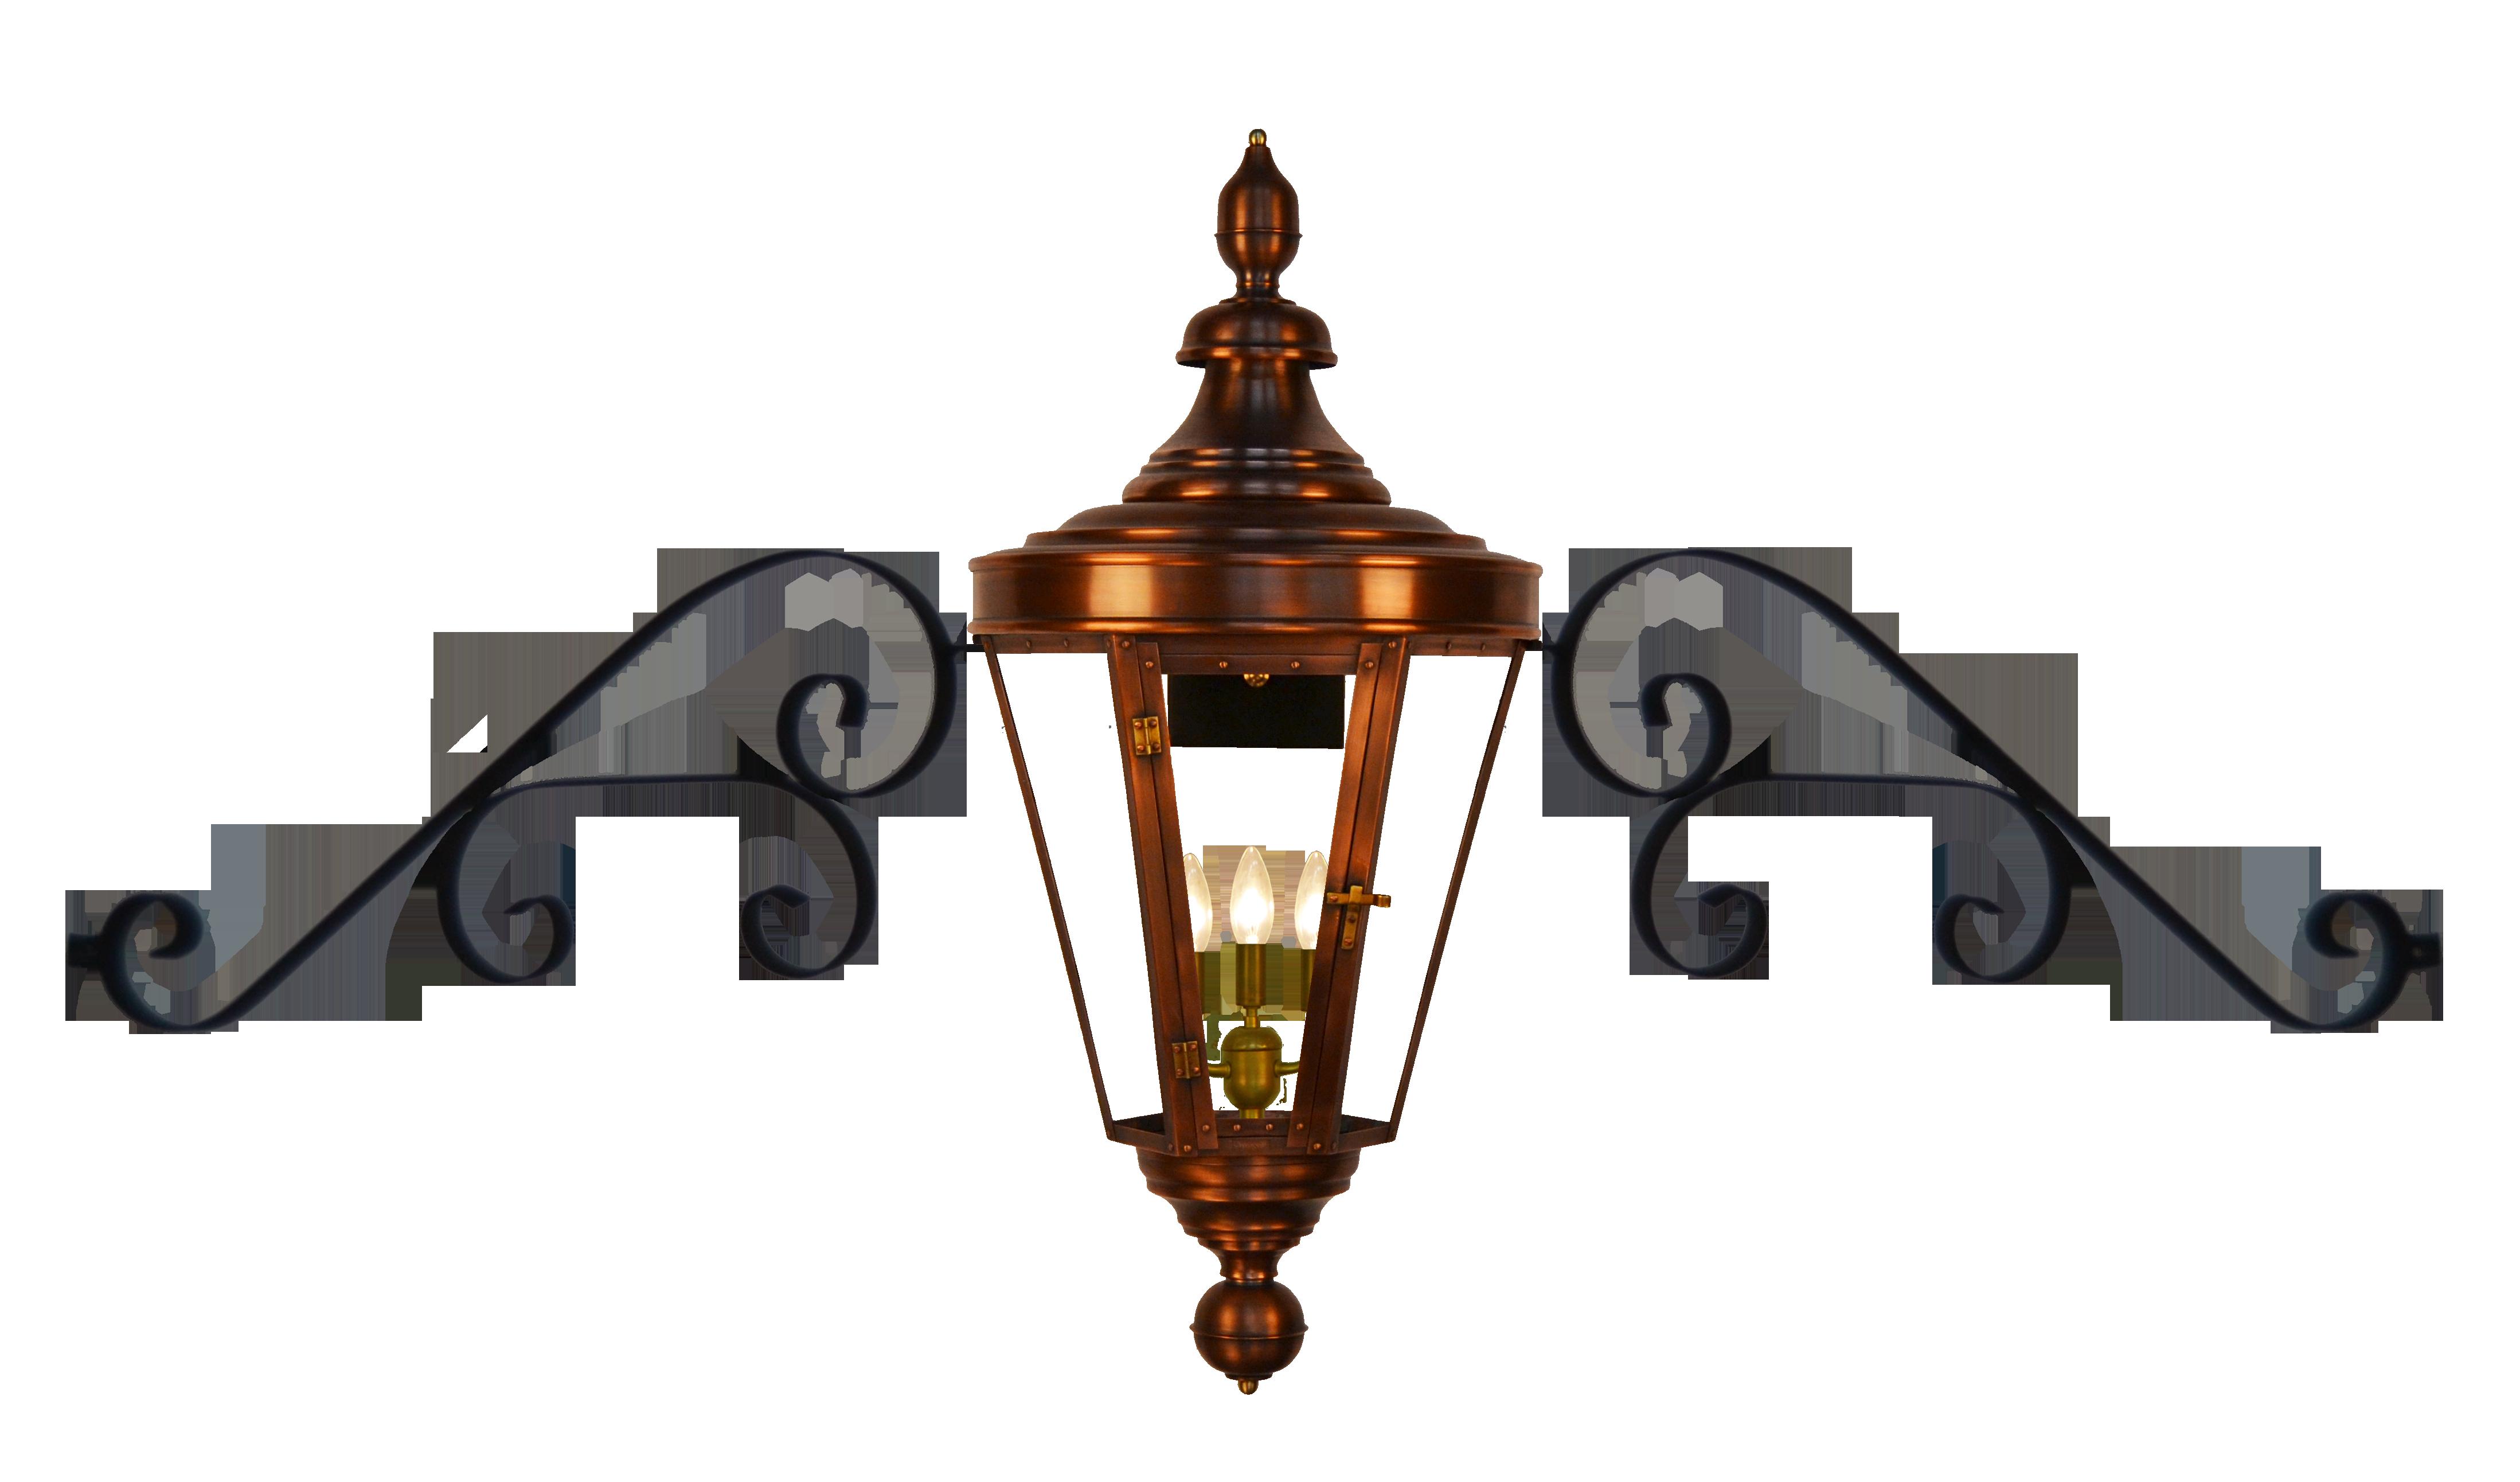 Royal Street Lantern - The CopperSmith - French Market Lanterns